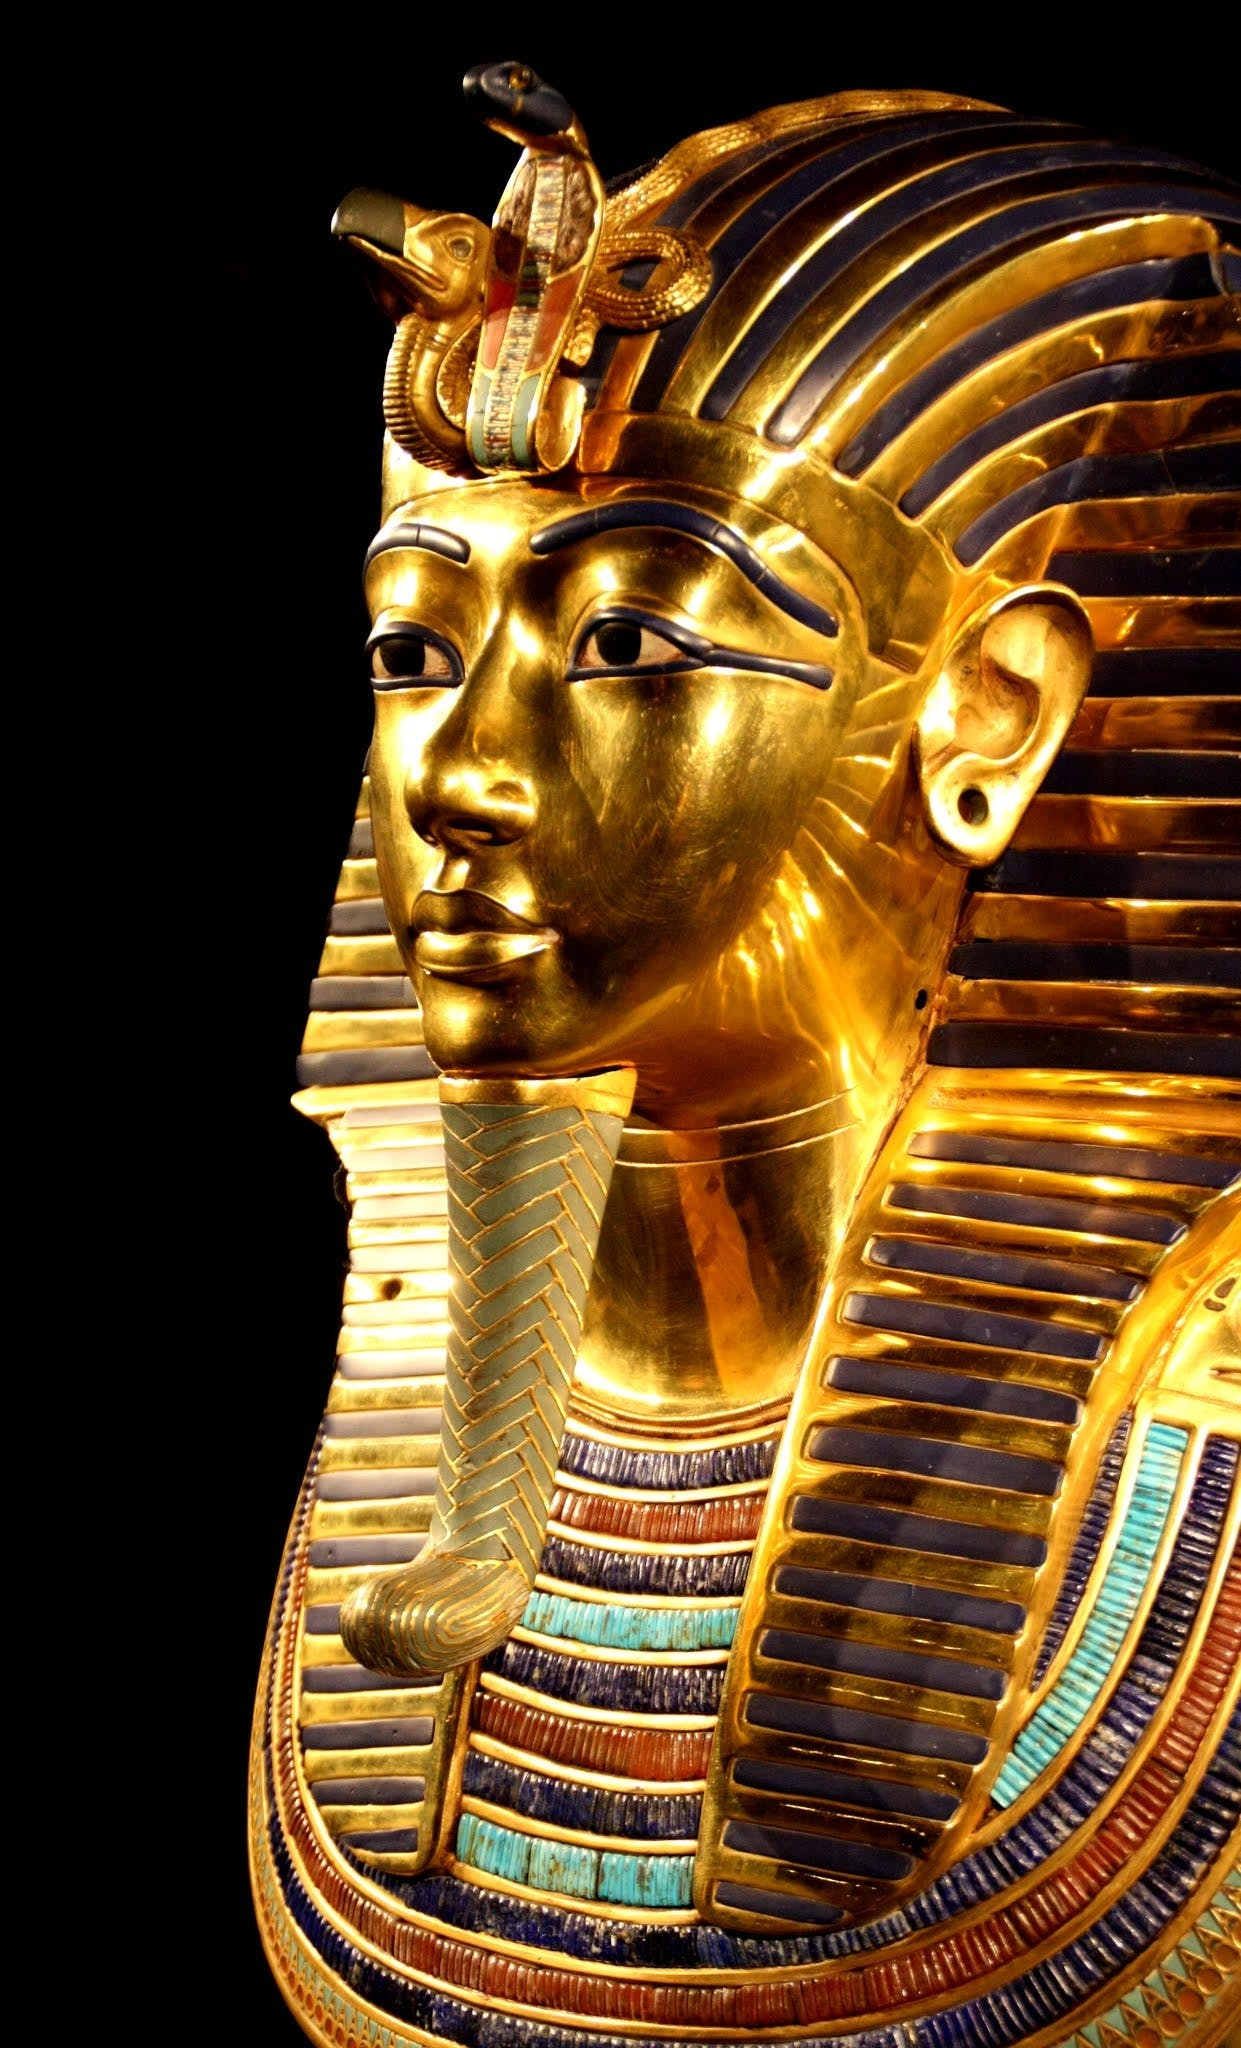 Kostenloses Stock Foto zu Ägypten, alt, gold, golden